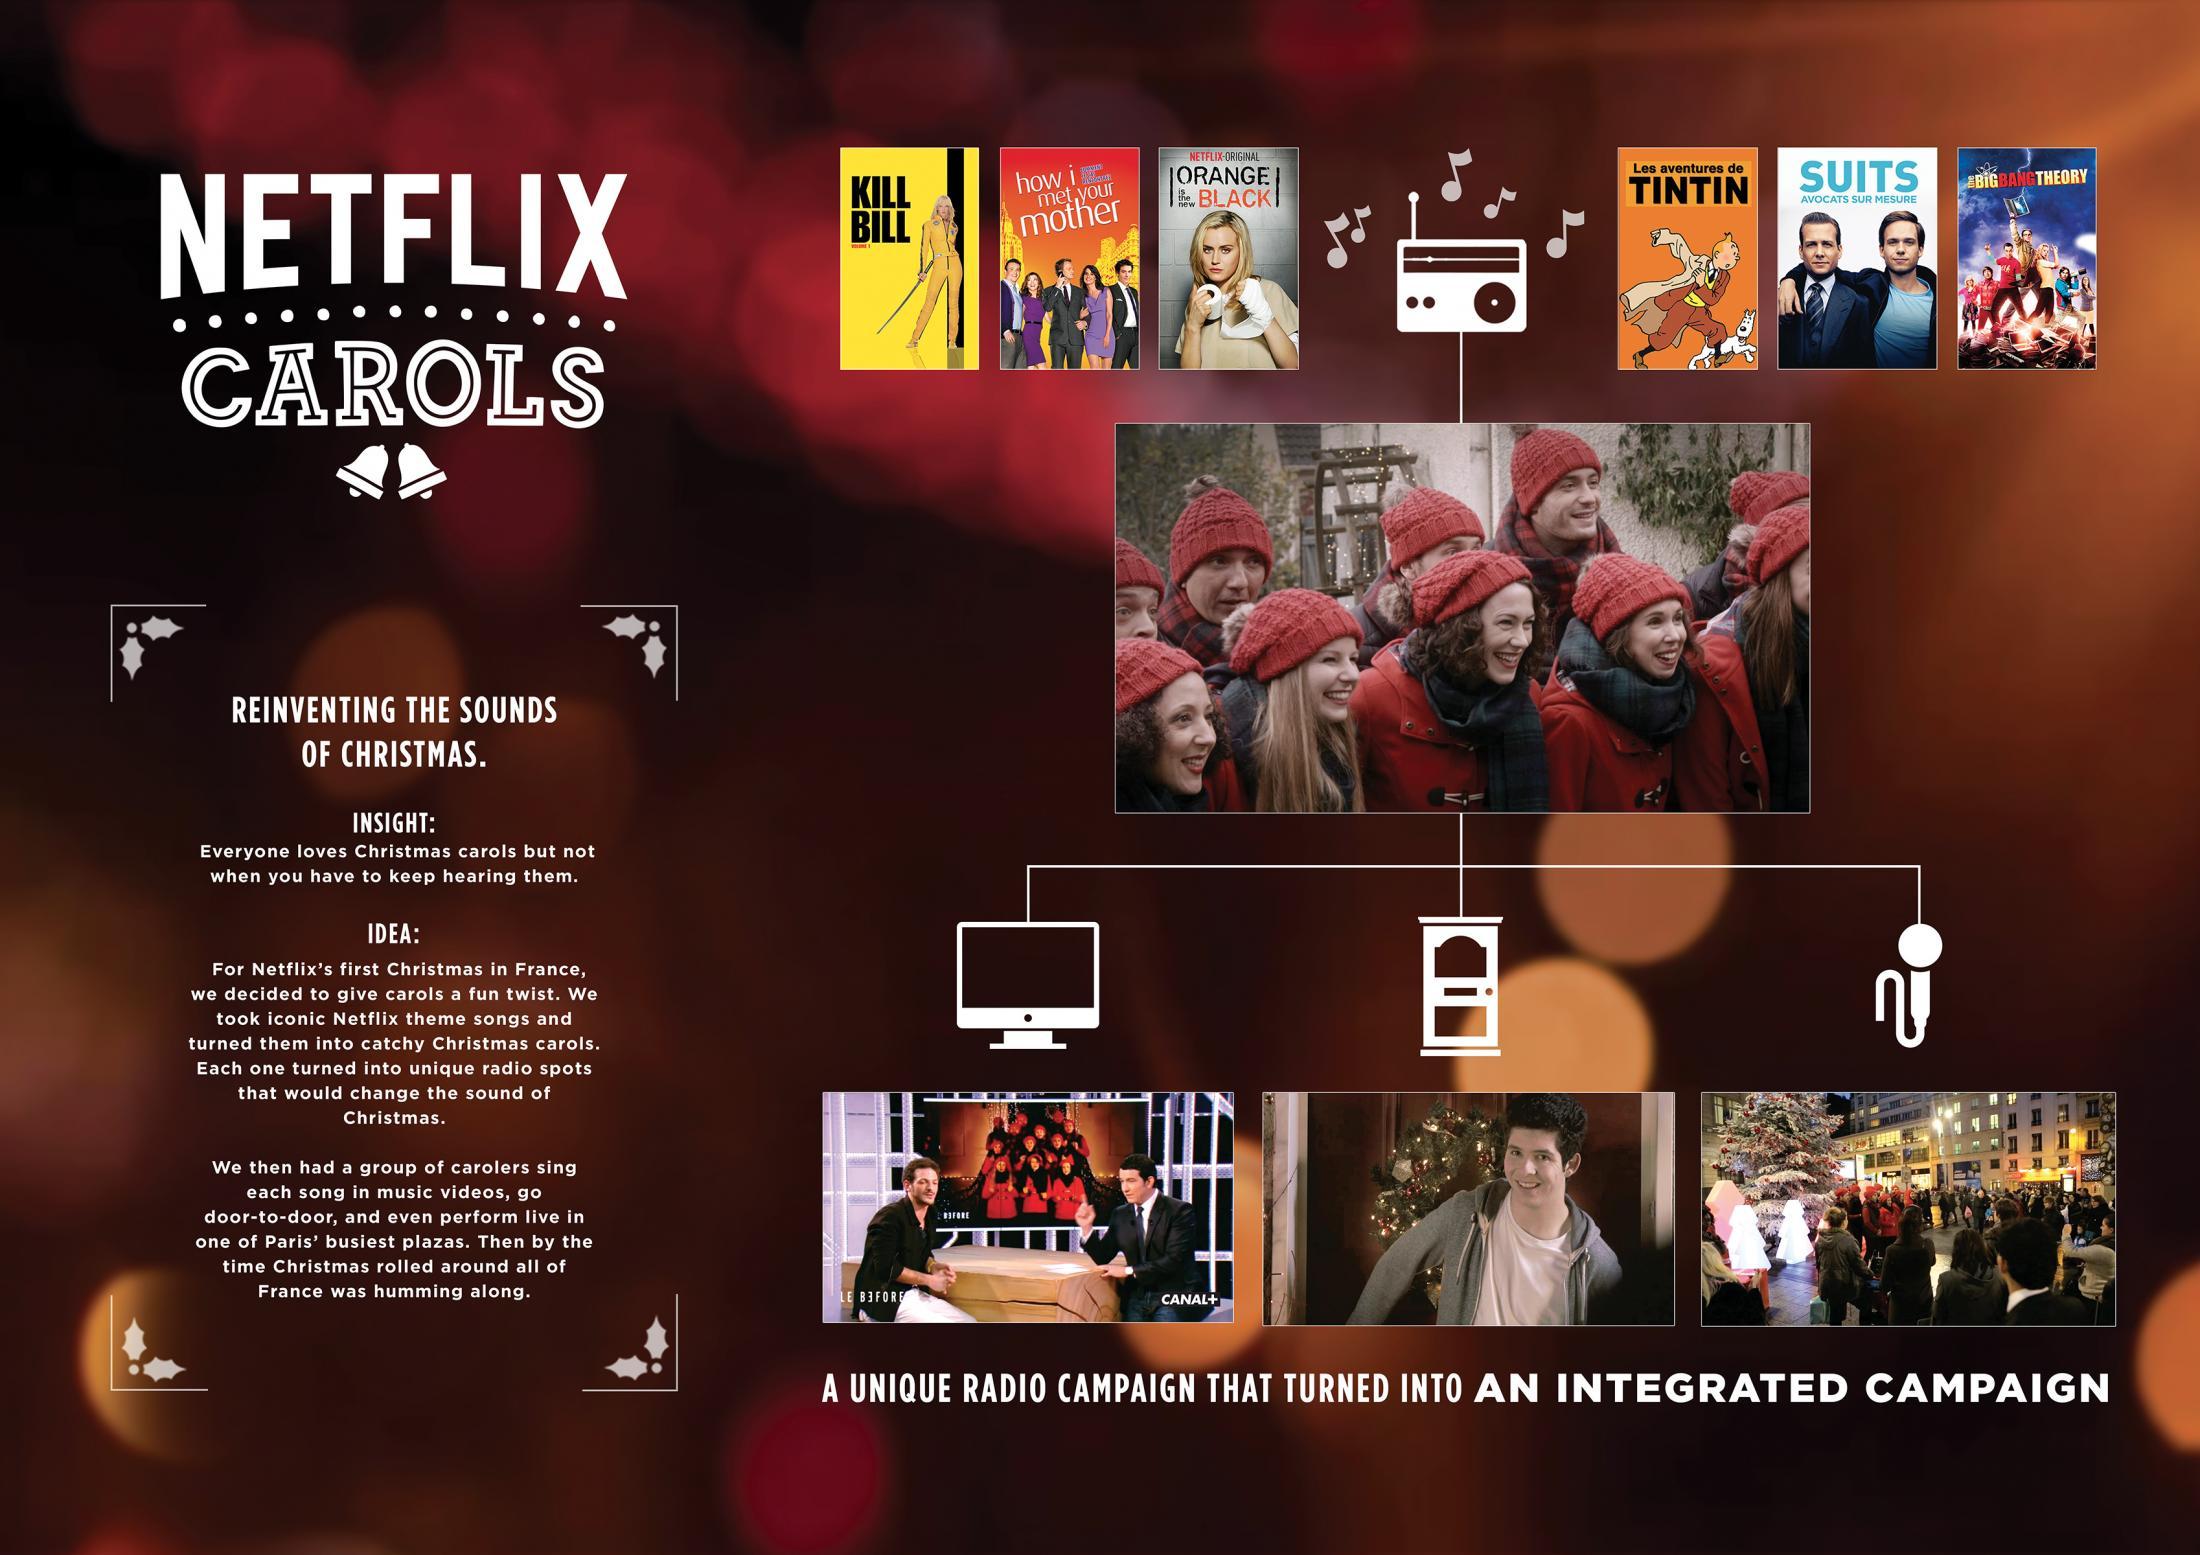 Thumbnail for NETFLIX CHRISTMAS CAROLS - ORANGE IS THE NEW BLACK